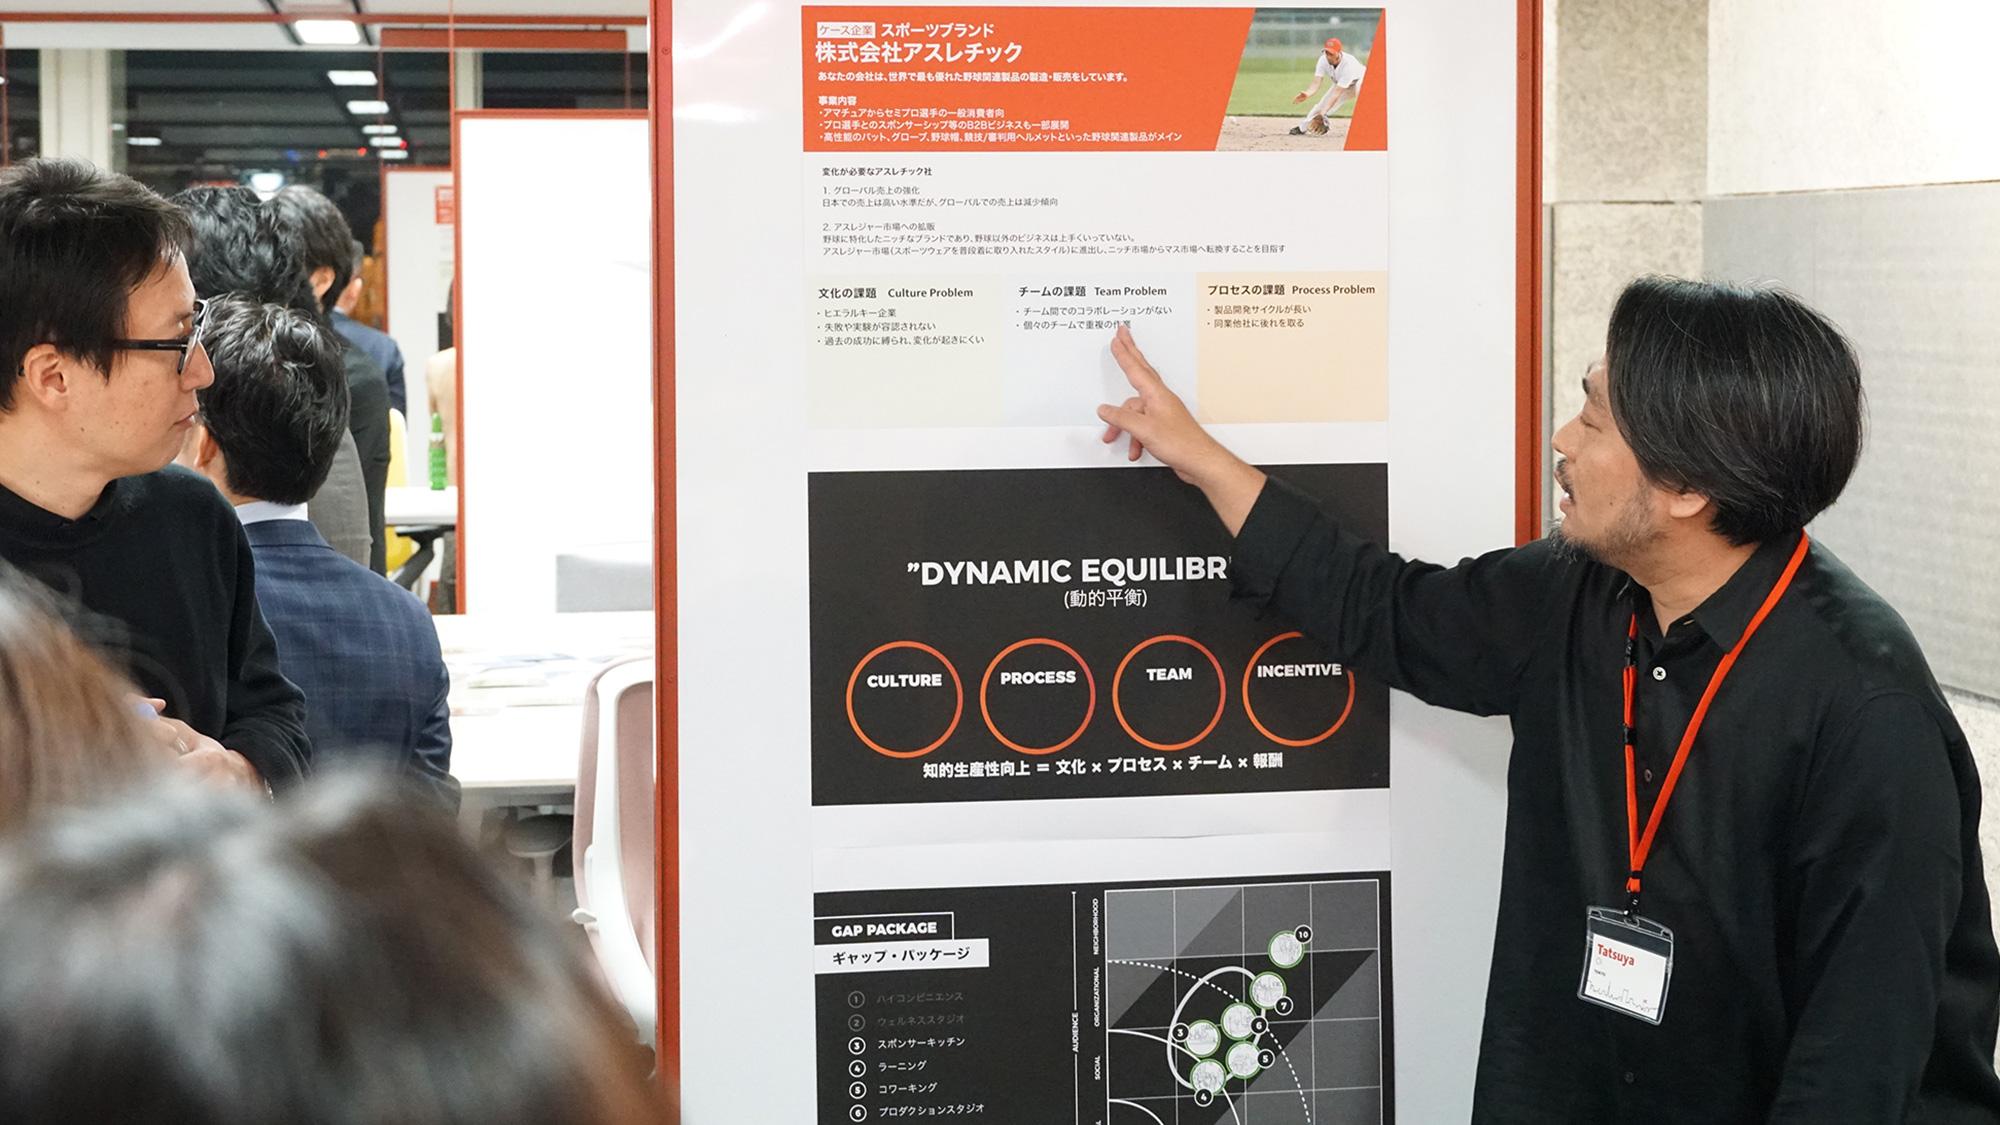 Gensler Tokyo facilitators discuss how to create a balanced workplace